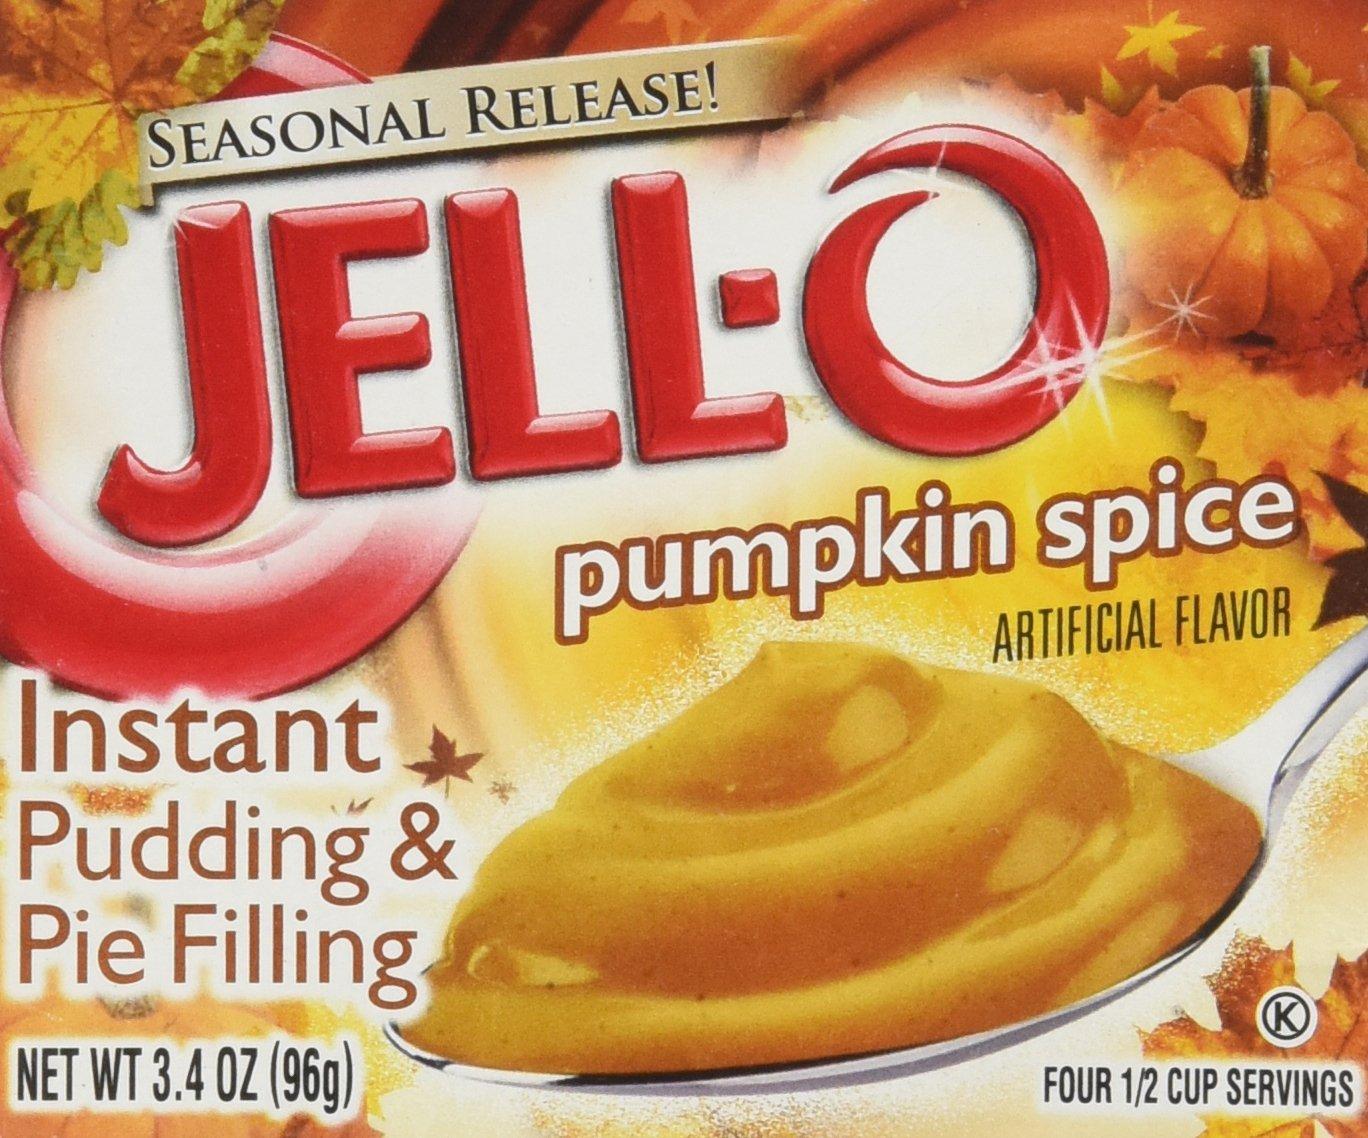 Kraft Jell-O Instant Pudding Dessert & Pie Filling, Pumpkin Spice, 3.4 Oz. Box